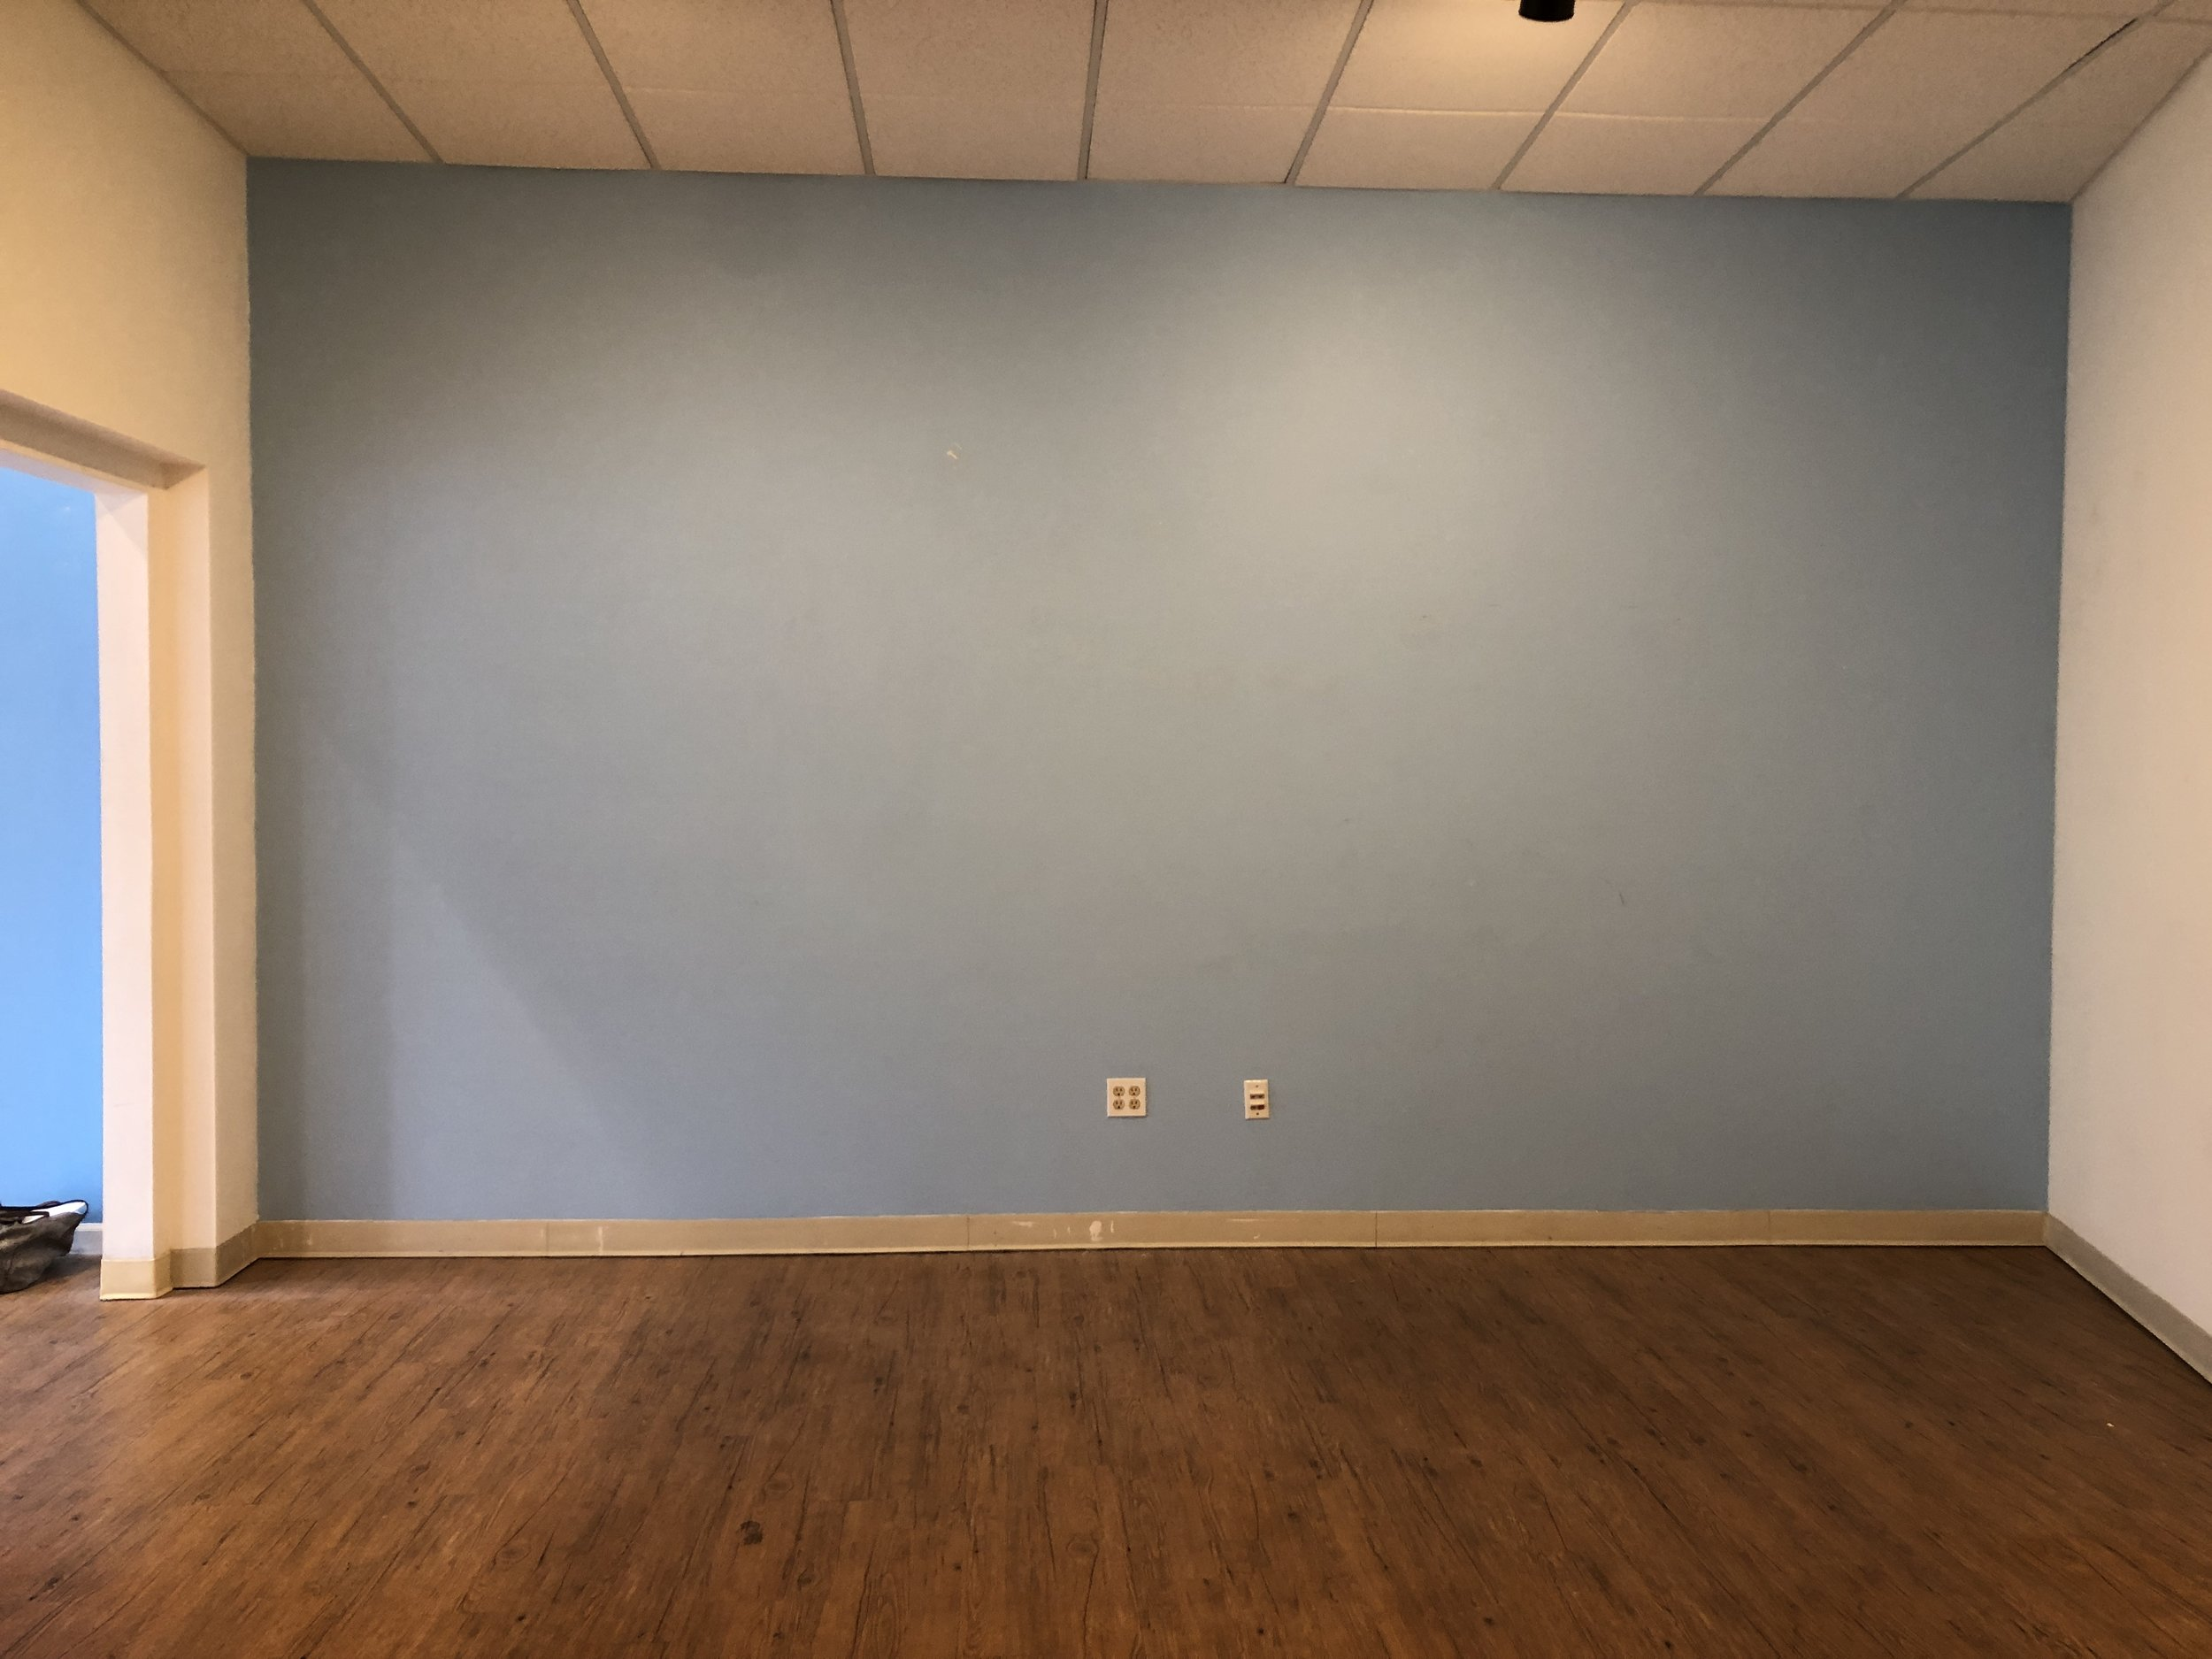 BEFORE: Depressing ceiling tiles